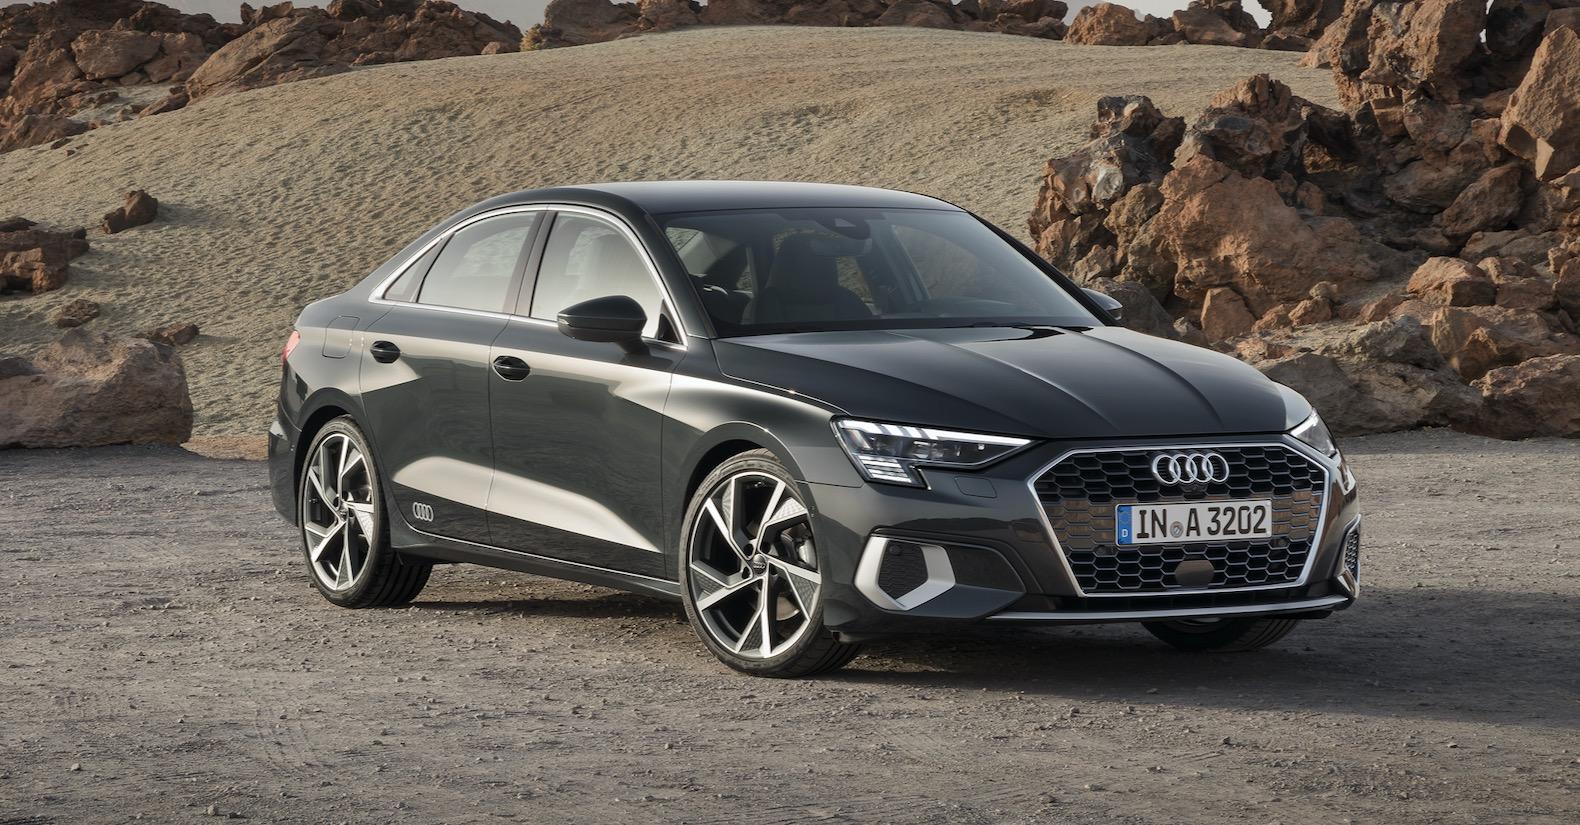 2022 Audi A3 sedan will arrive late next year | The Torque ...